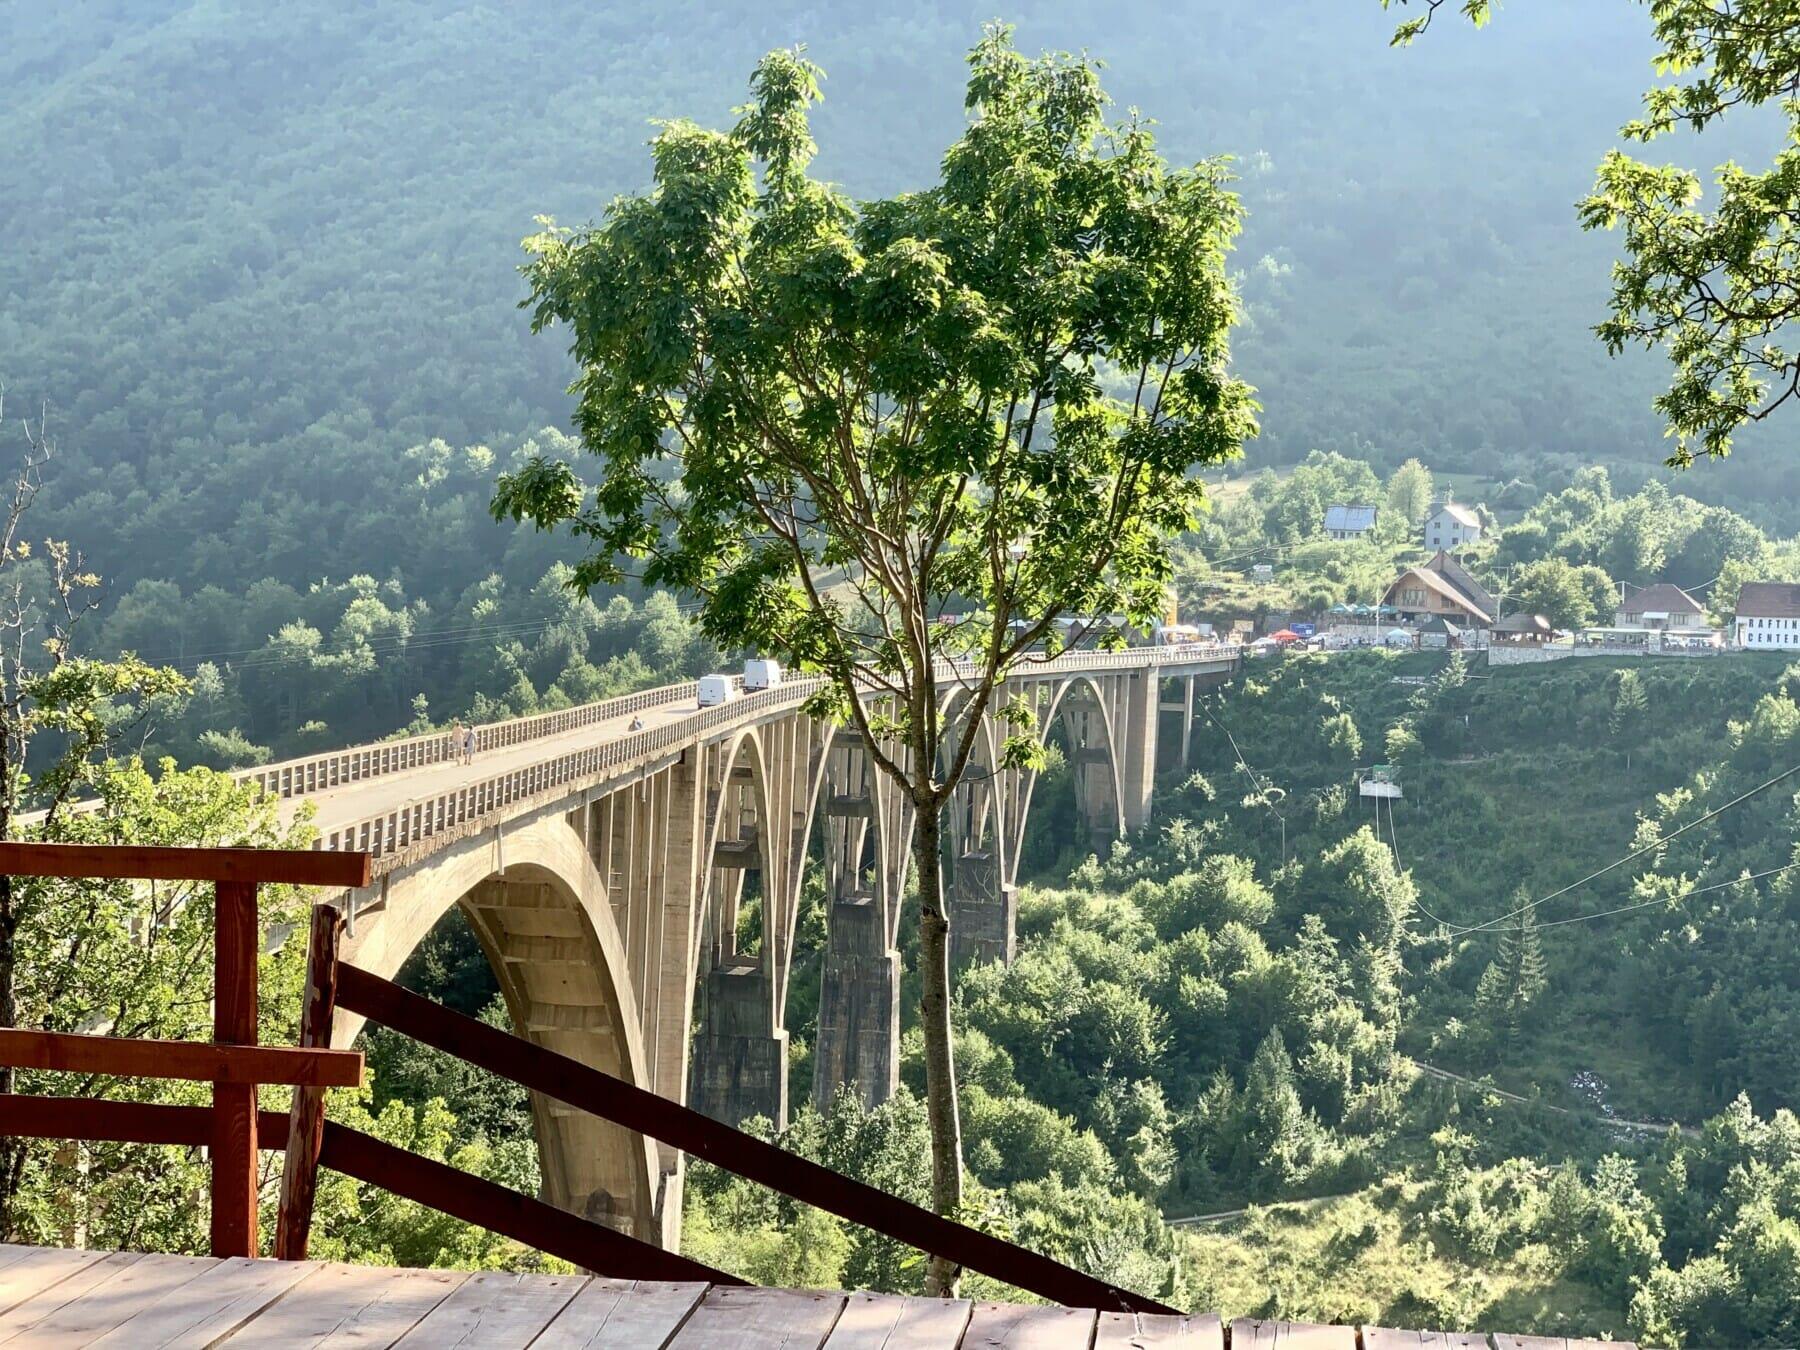 View of the Djurdjevica Tara Bridge from the local national restaurant Montenegro